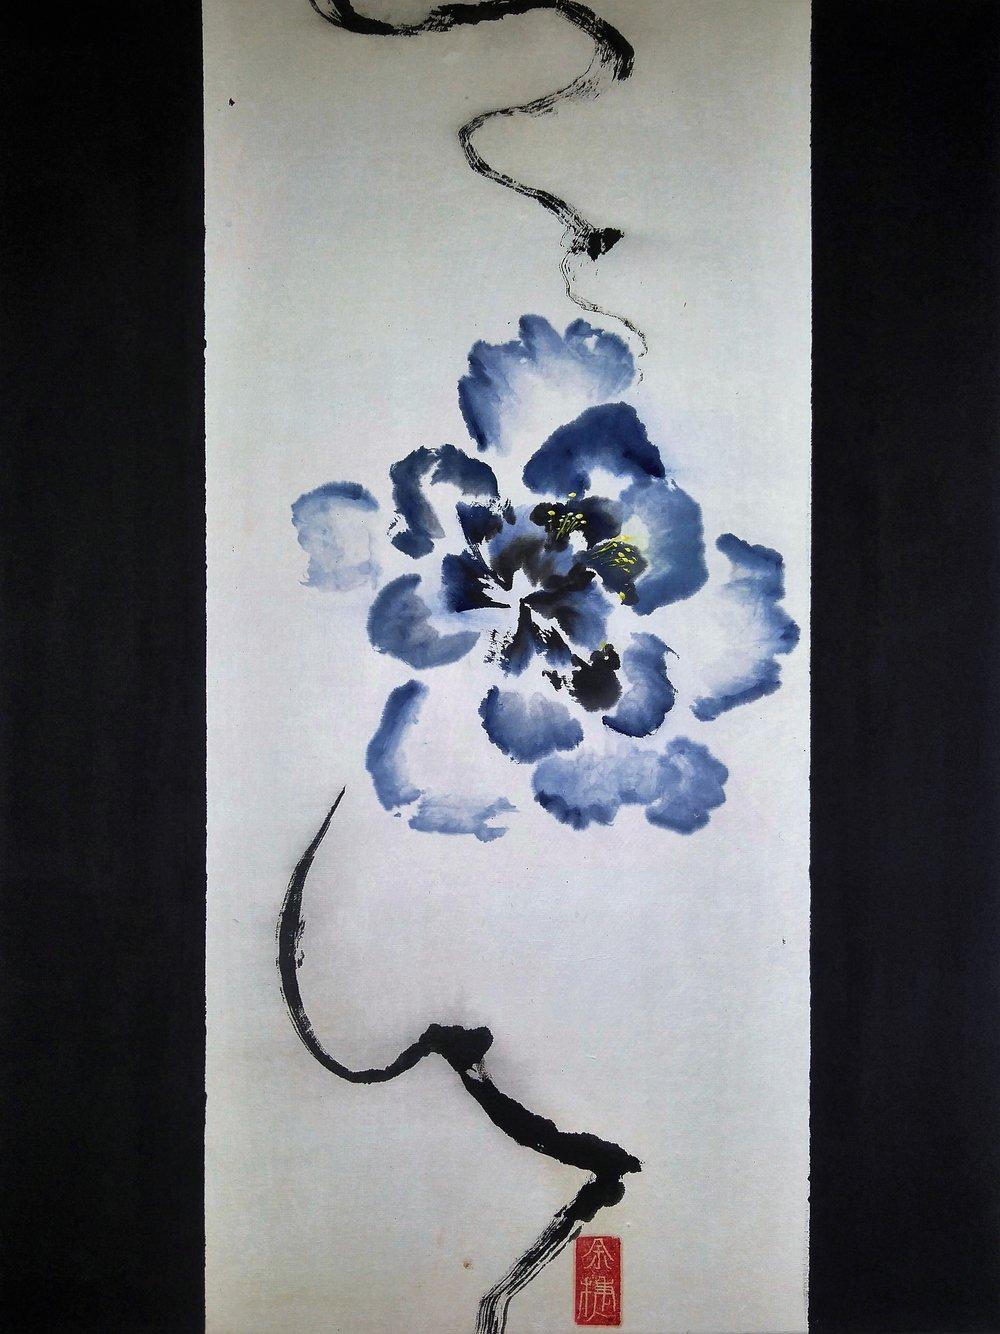 Blue, 24 x 18 x 0.75 inches